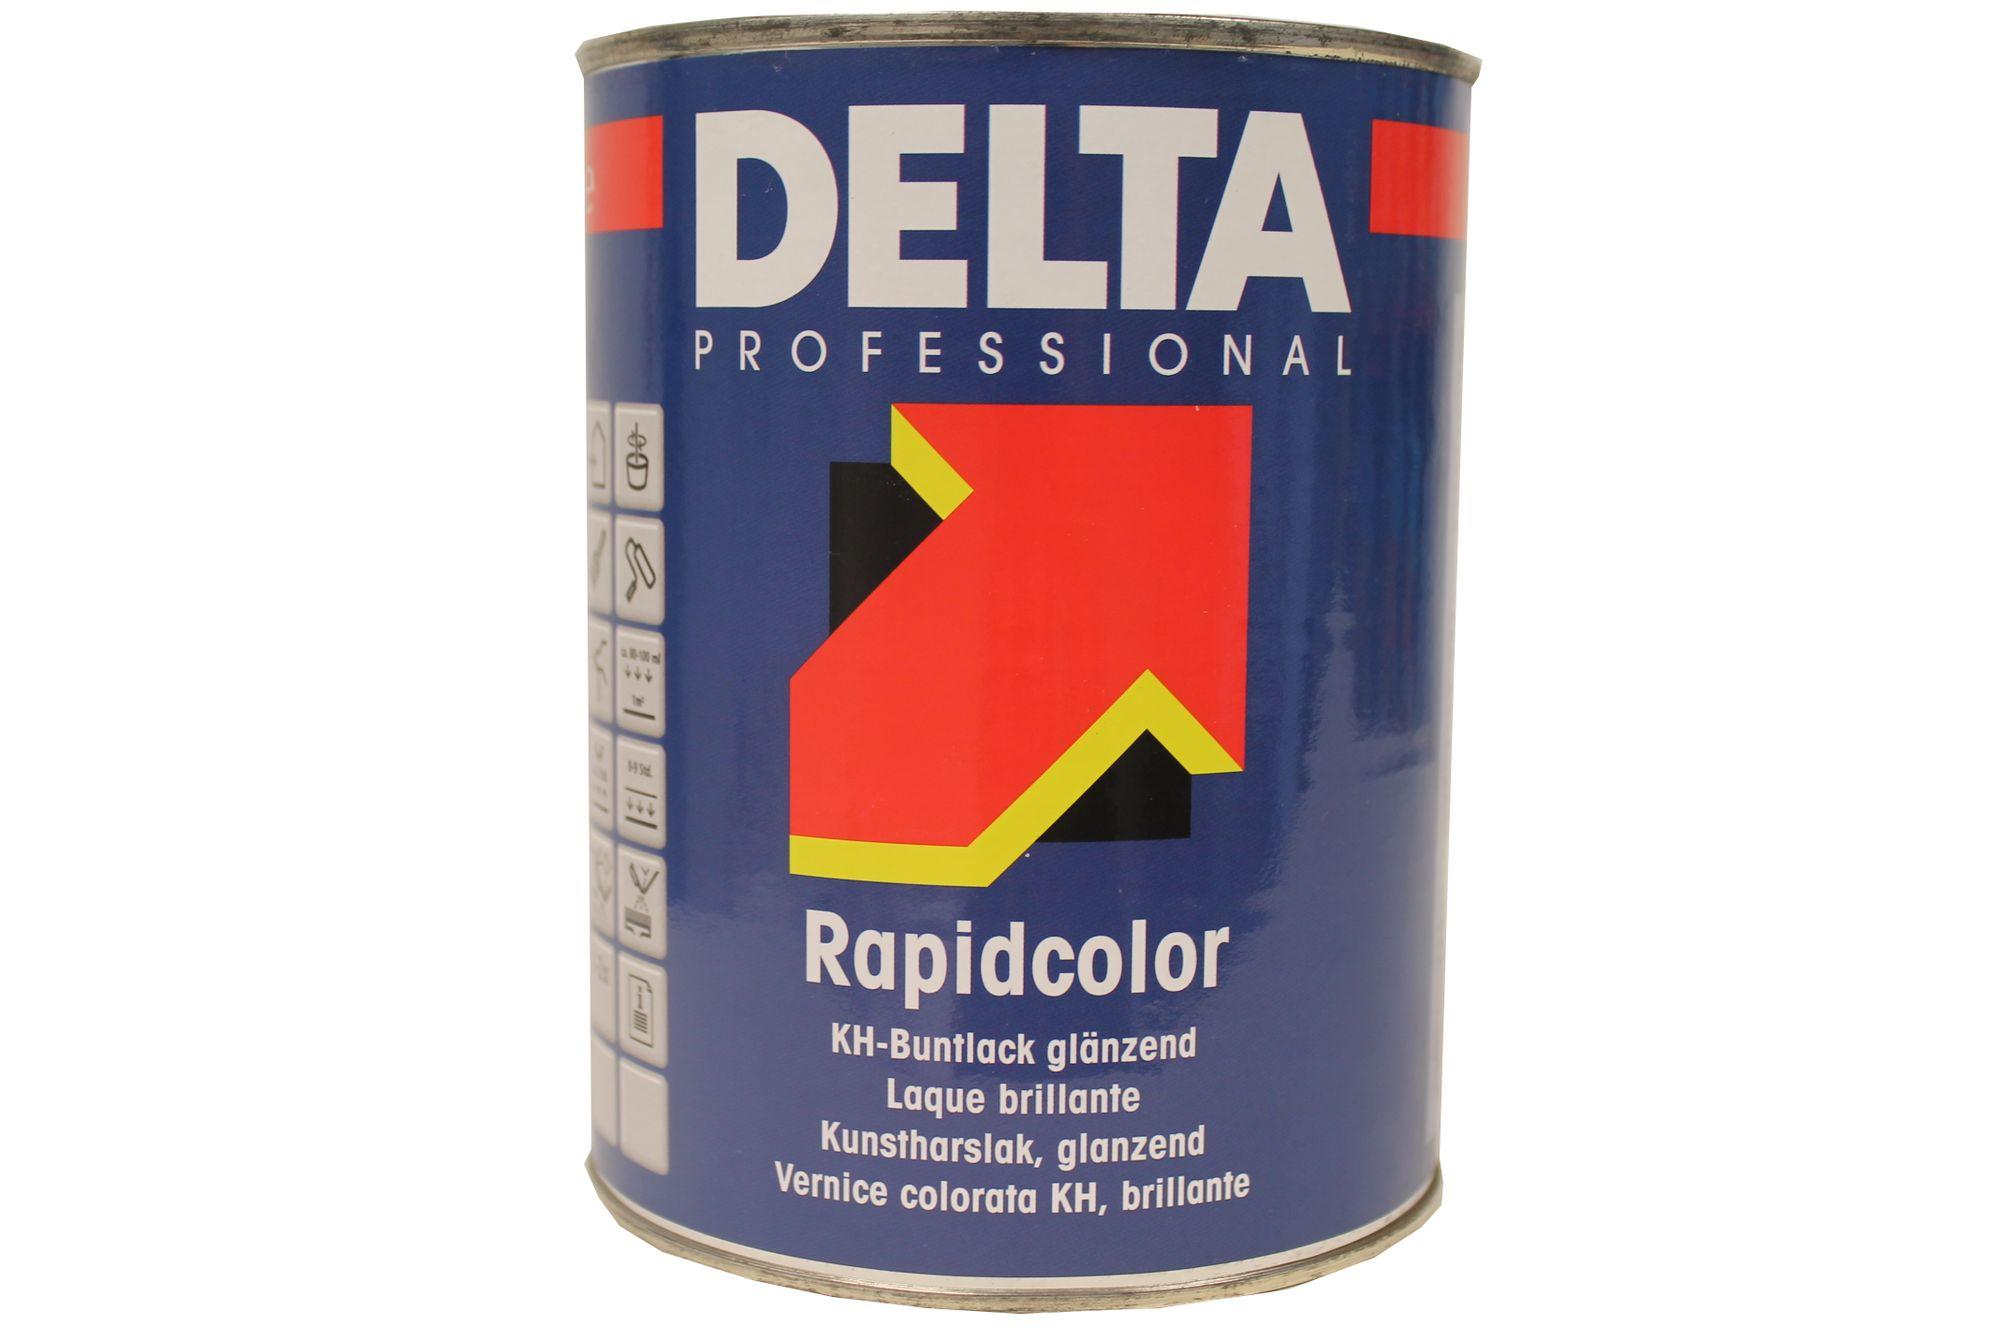 Delta Professional Rapidcolor KH-Buntlack innen/außen lösemittelhaltig 1 Liter Farbwahl